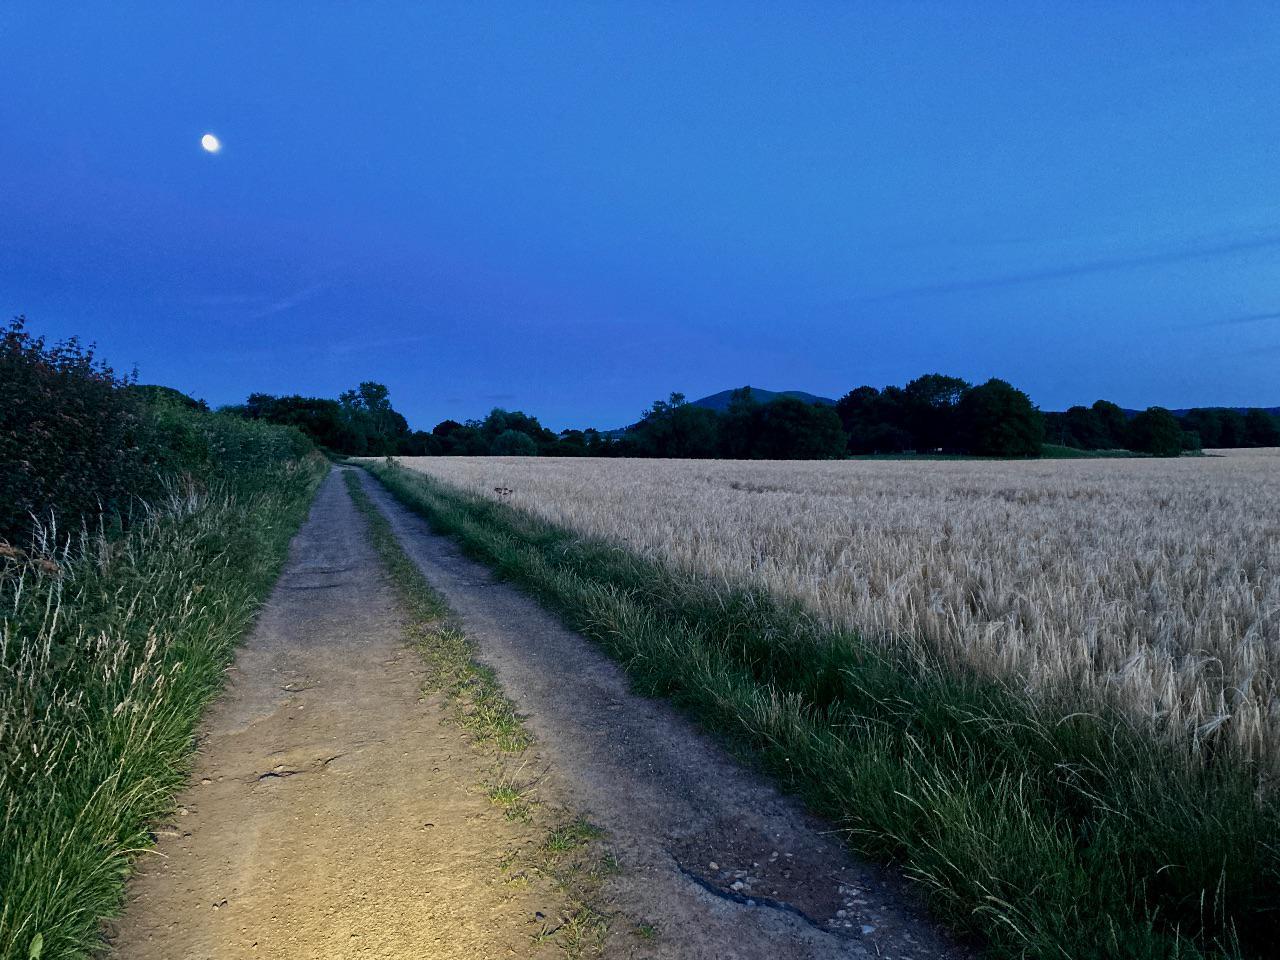 Bike light illuminates a track at night